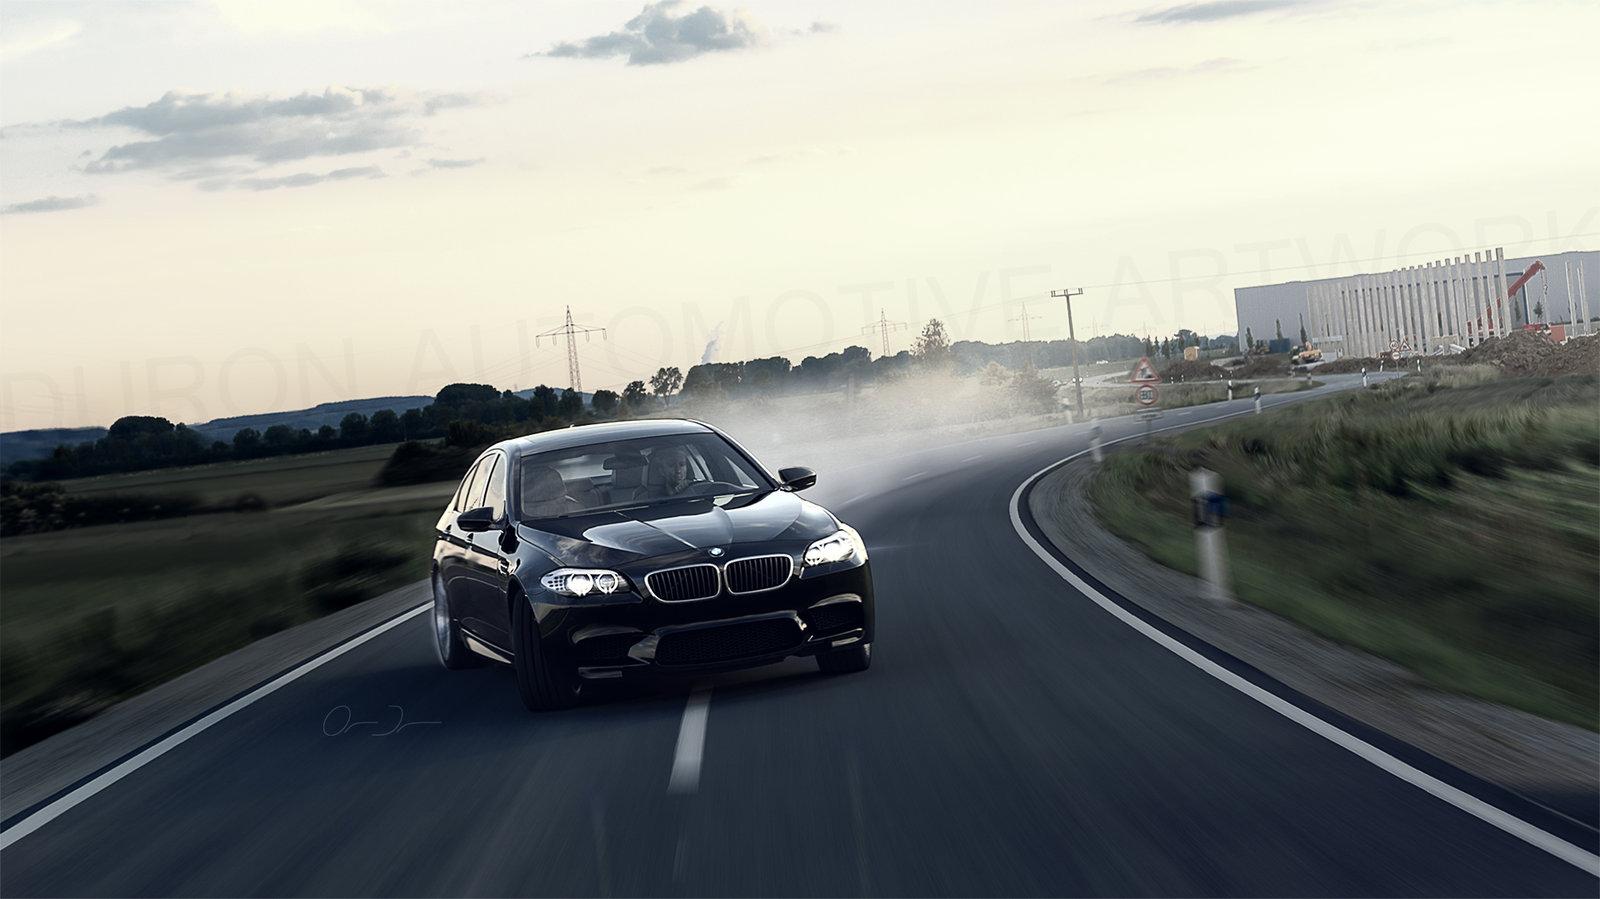 BMW-M-Let-s-drift-by-DuronDesign-deviantart-com-on-deviantART-wallpaper-wp5204746